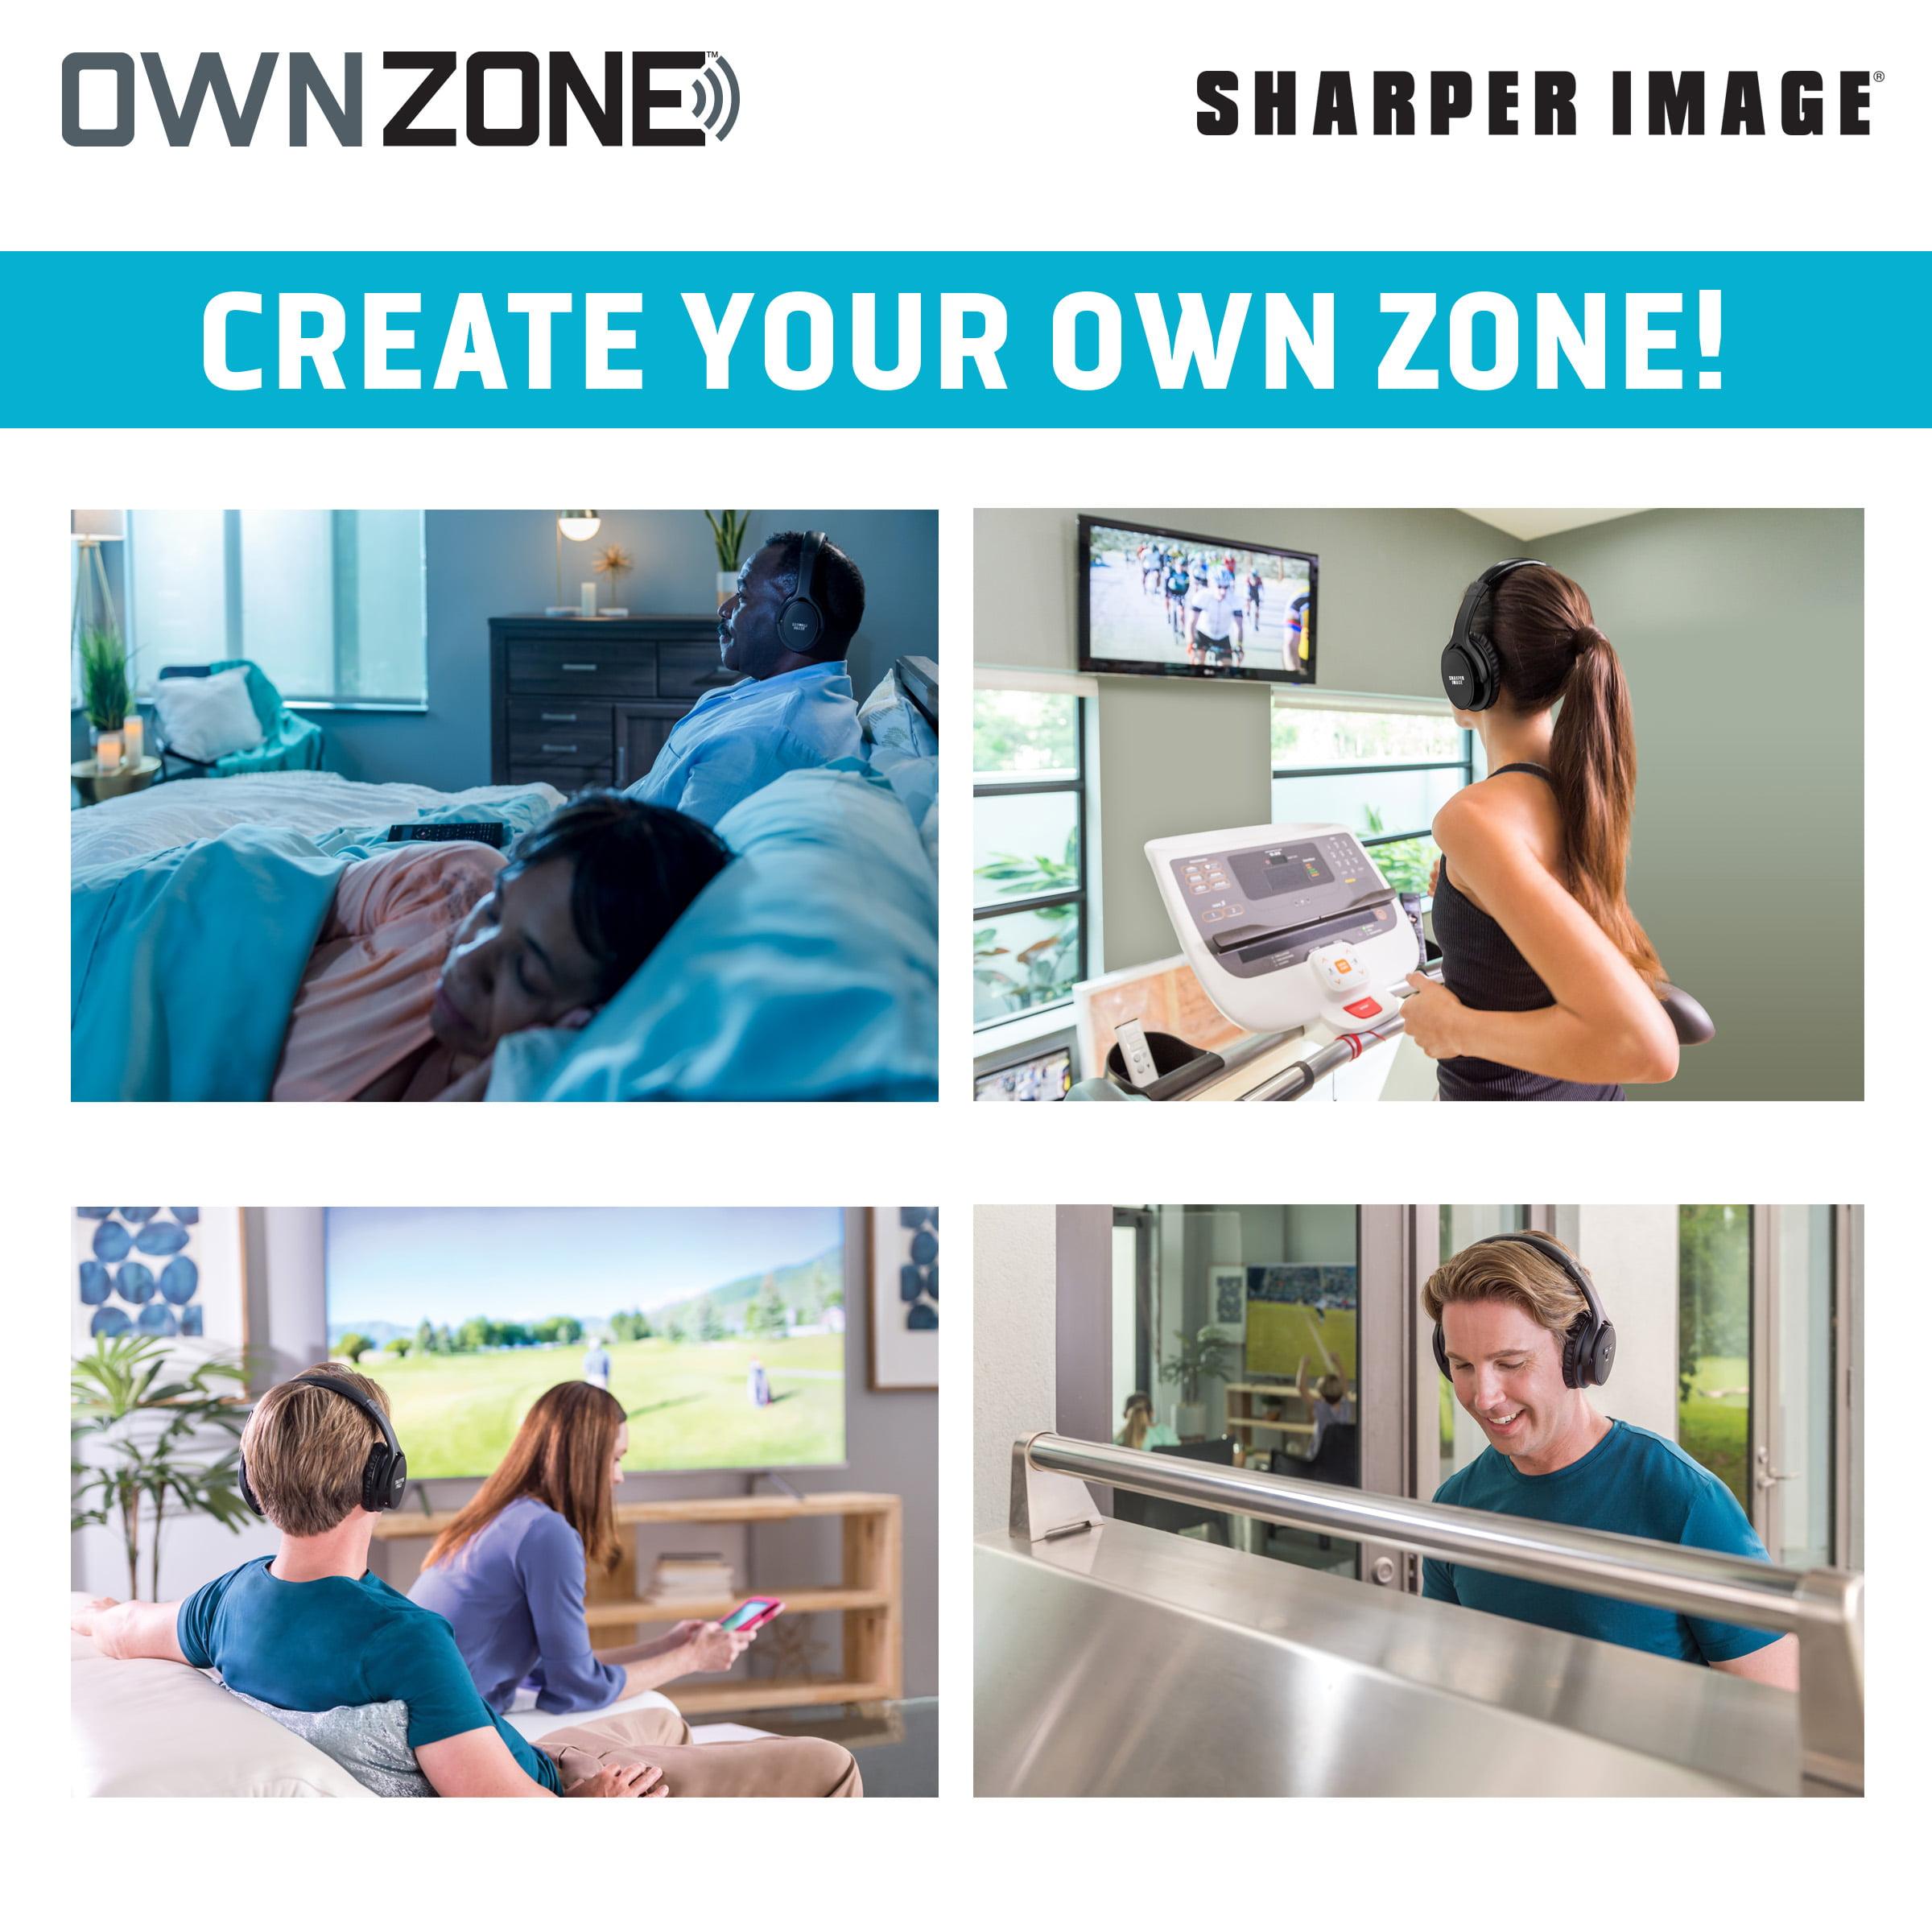 Own Zone Wireless Tv Headphones By Sharper Image Walmartcom